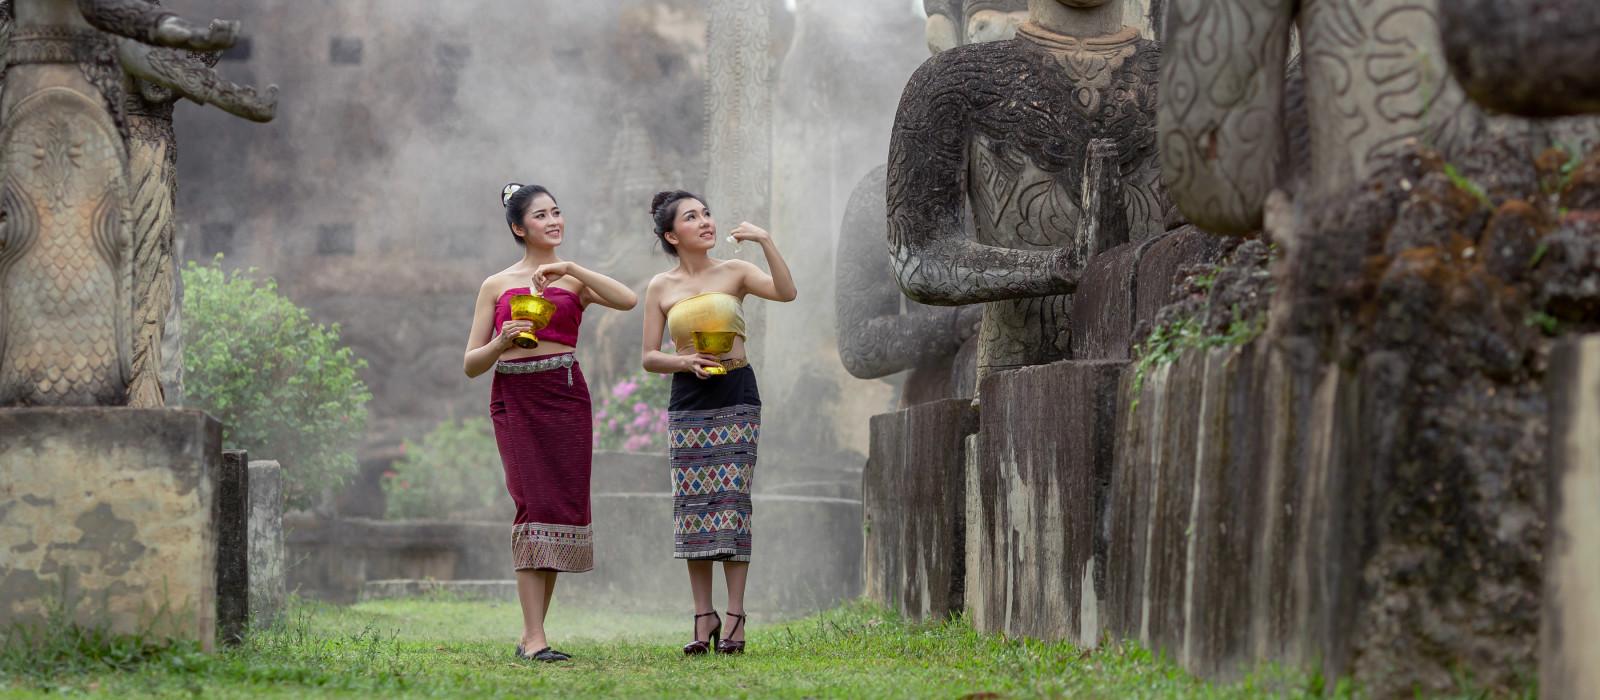 Beautiful Lao woman splashing water during Songkran Festival, Lao Vientiane Tradition, Asia - Laos travel guide